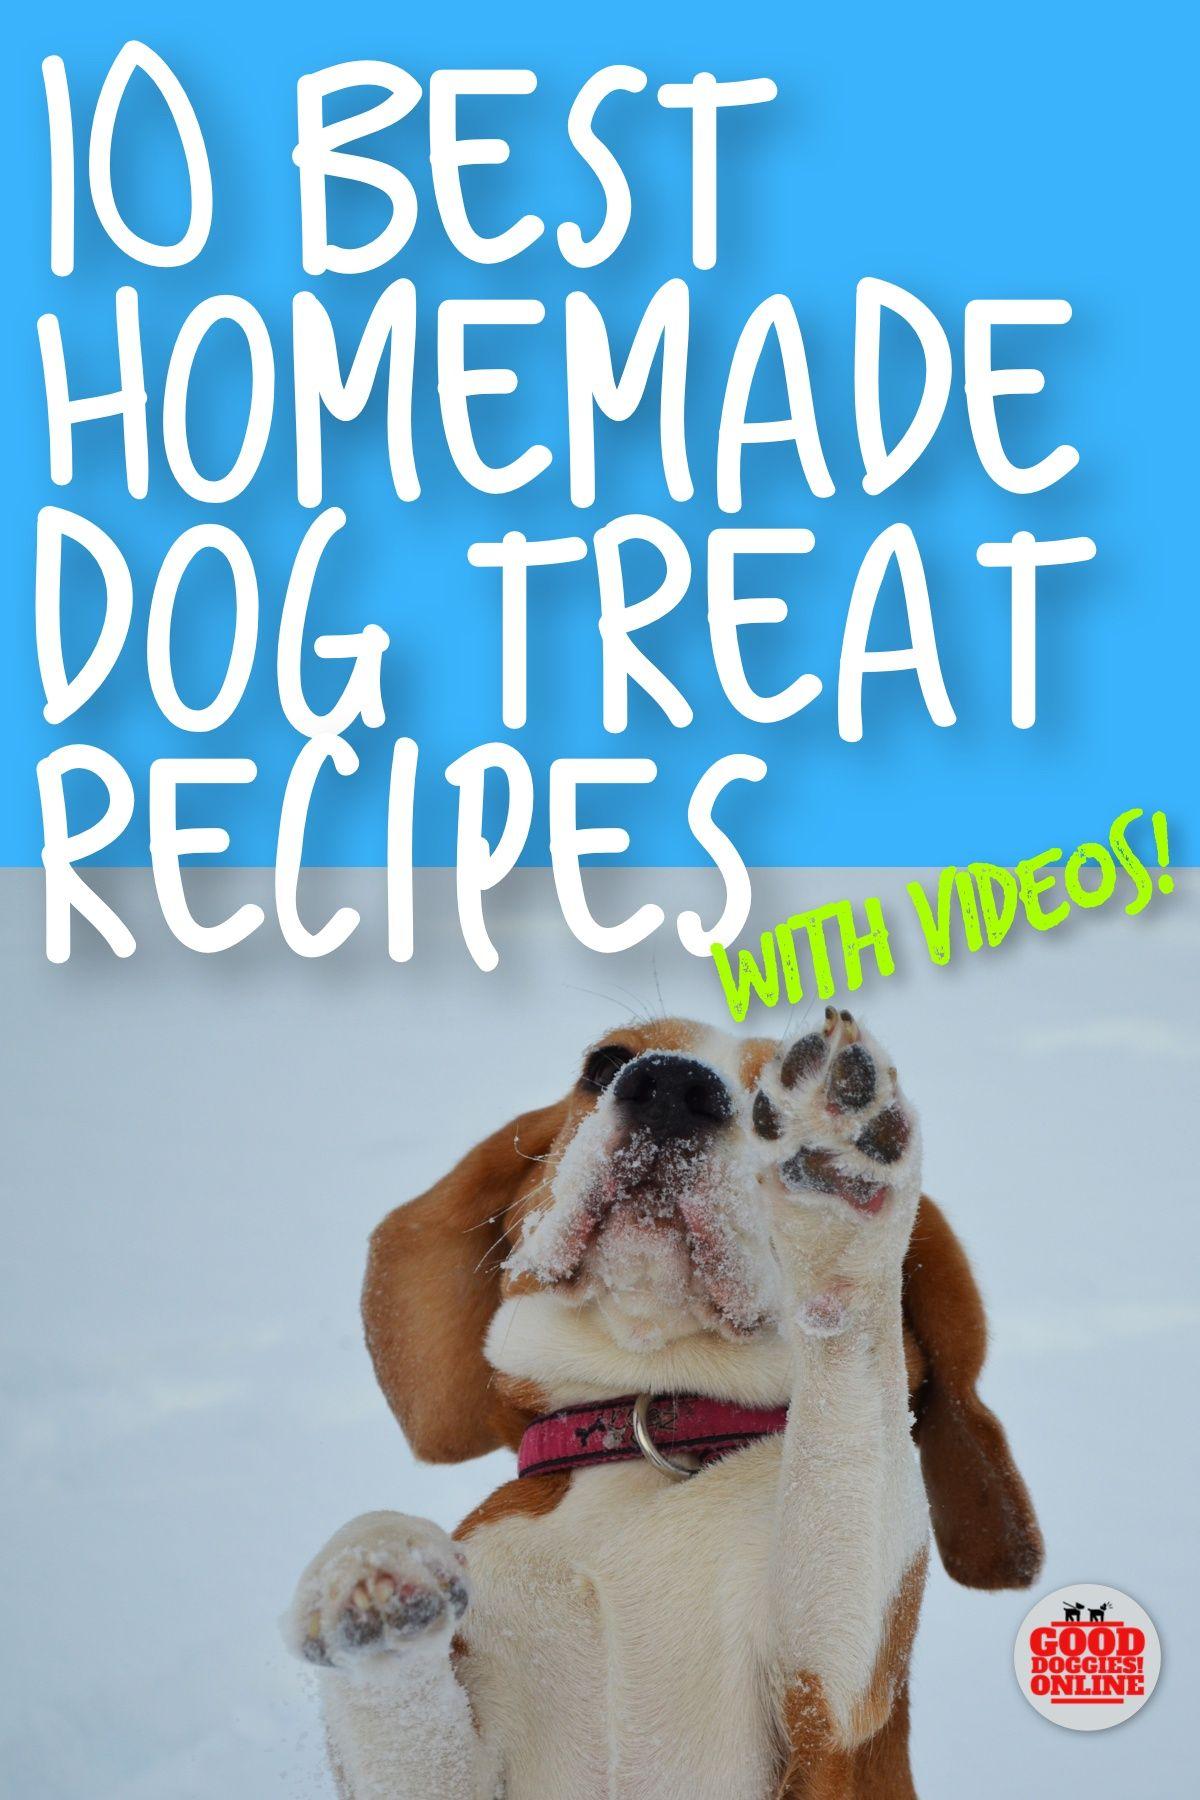 Homemade Dog Treat Recipes Video Help Good Doggies Online Dog Training Homemade Dog Your Dog